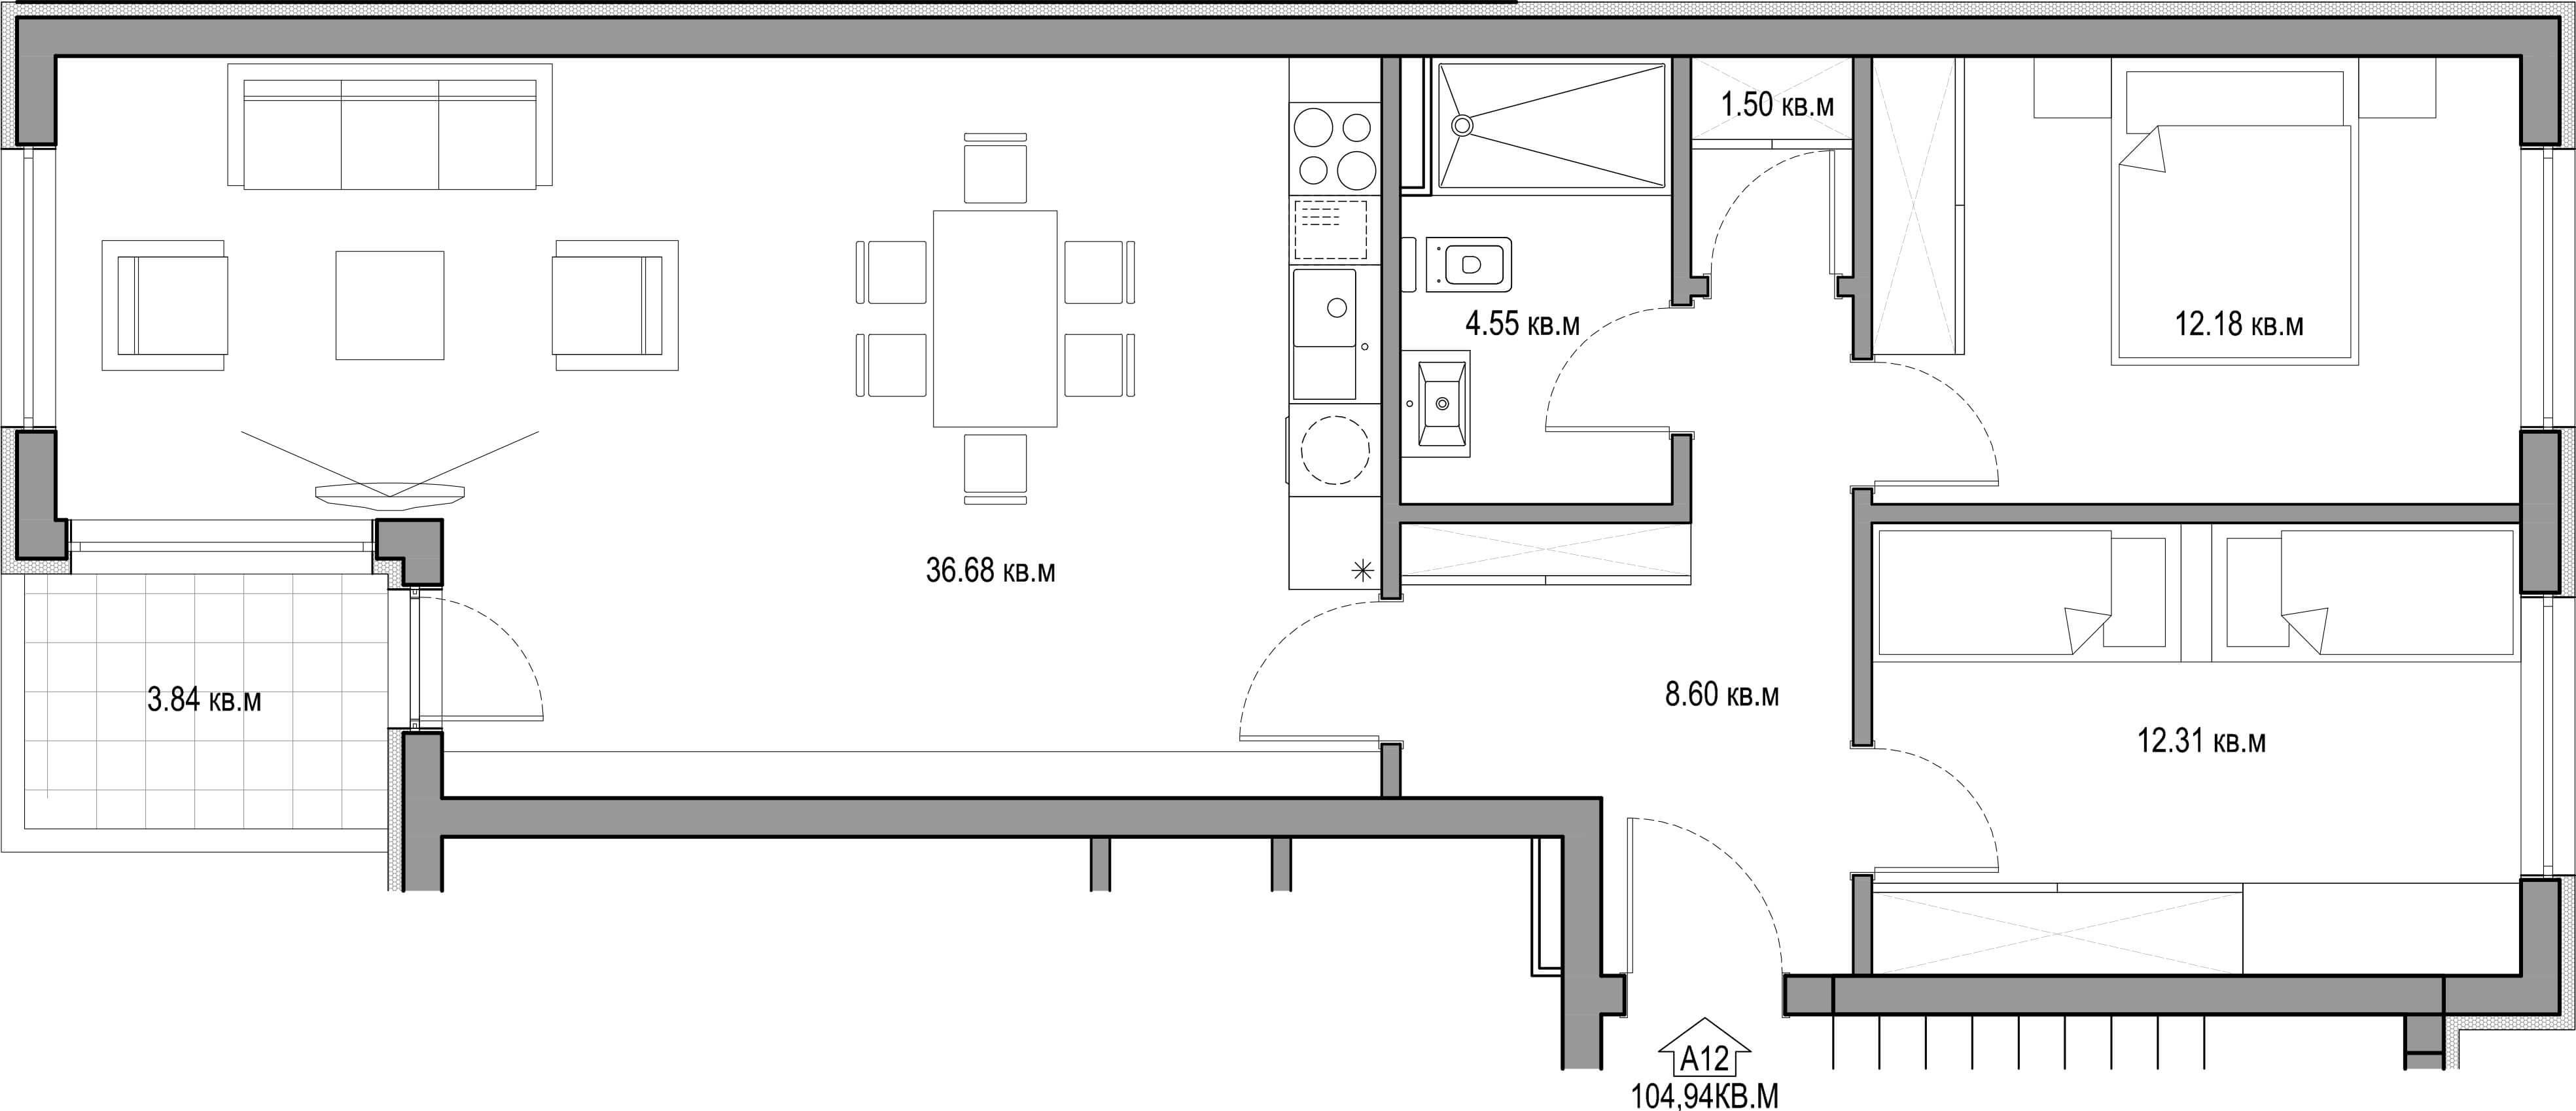 Vinitsa_Apartment_1_12